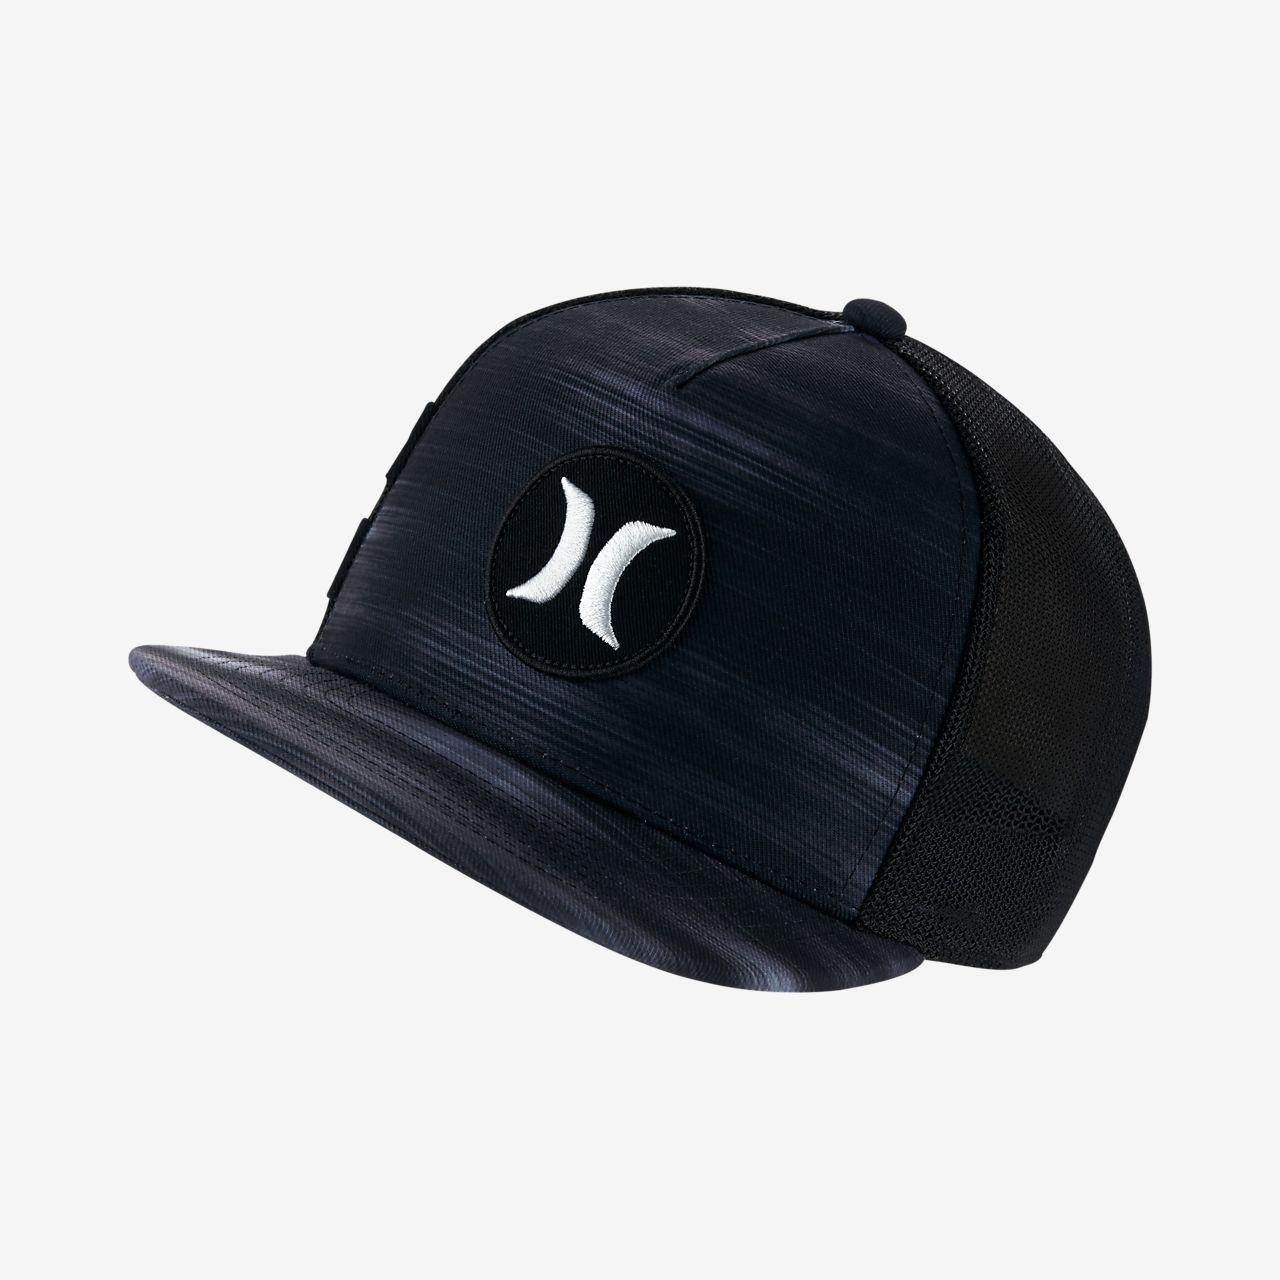 ... denmark hurley block party fast adjustable hat b11e4 b8d70 a38b2b79991